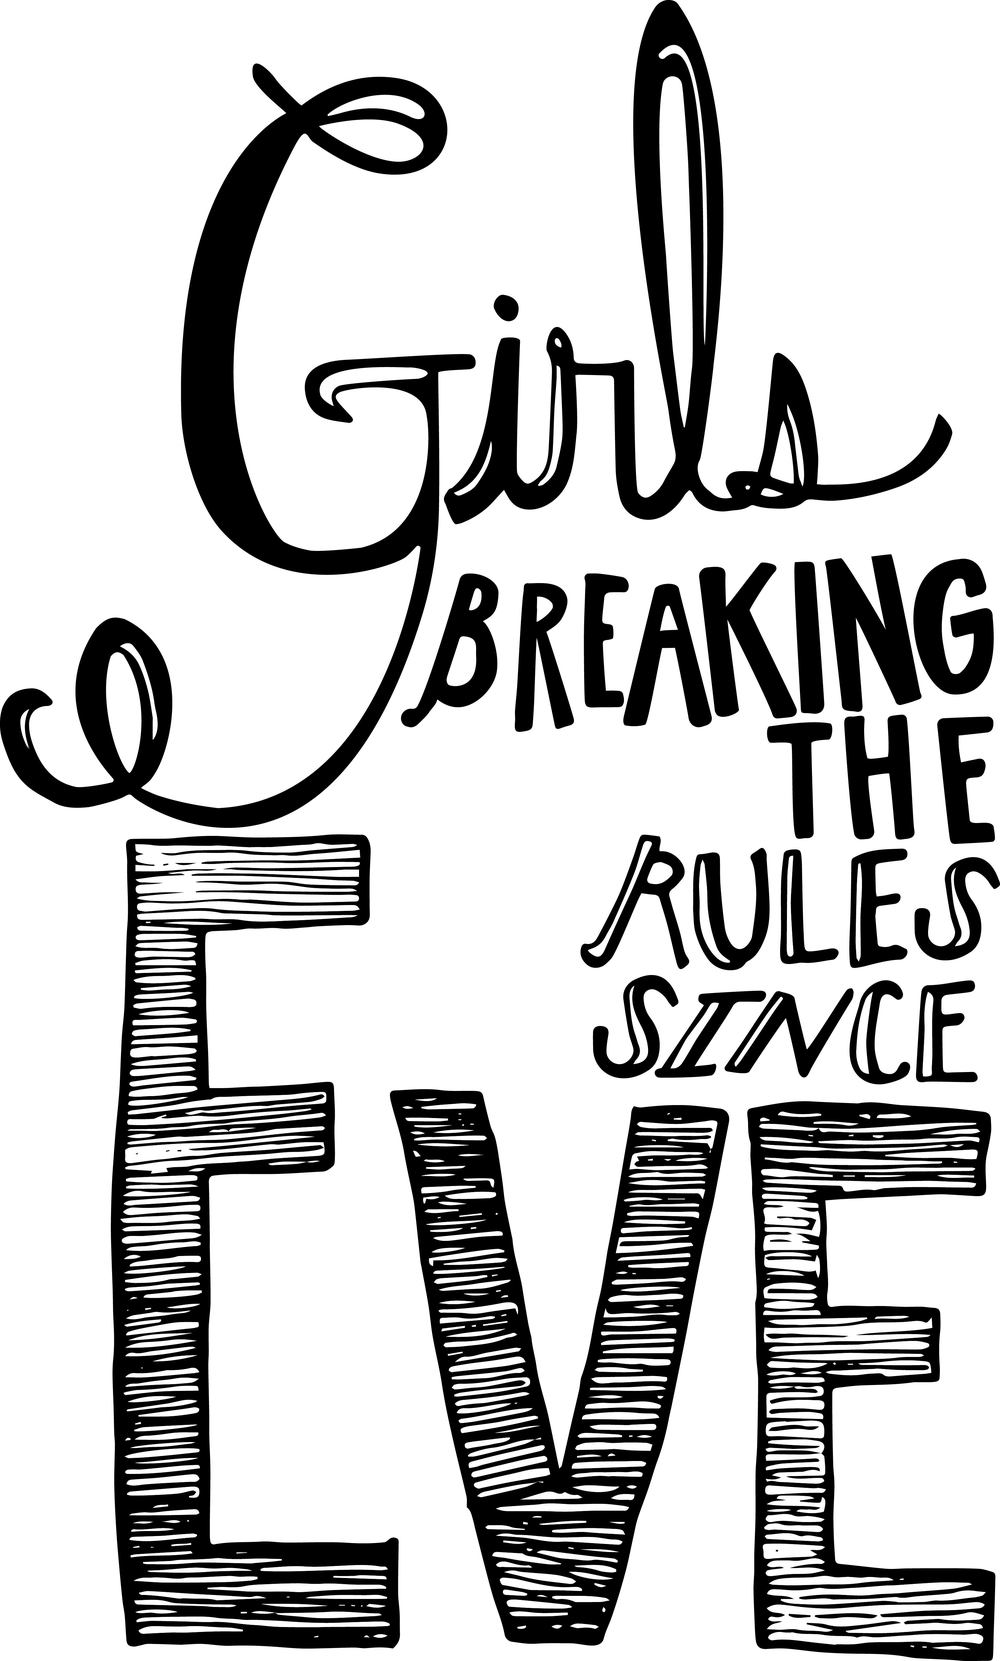 Girls breaking the rules since eve thumbnail.jpg